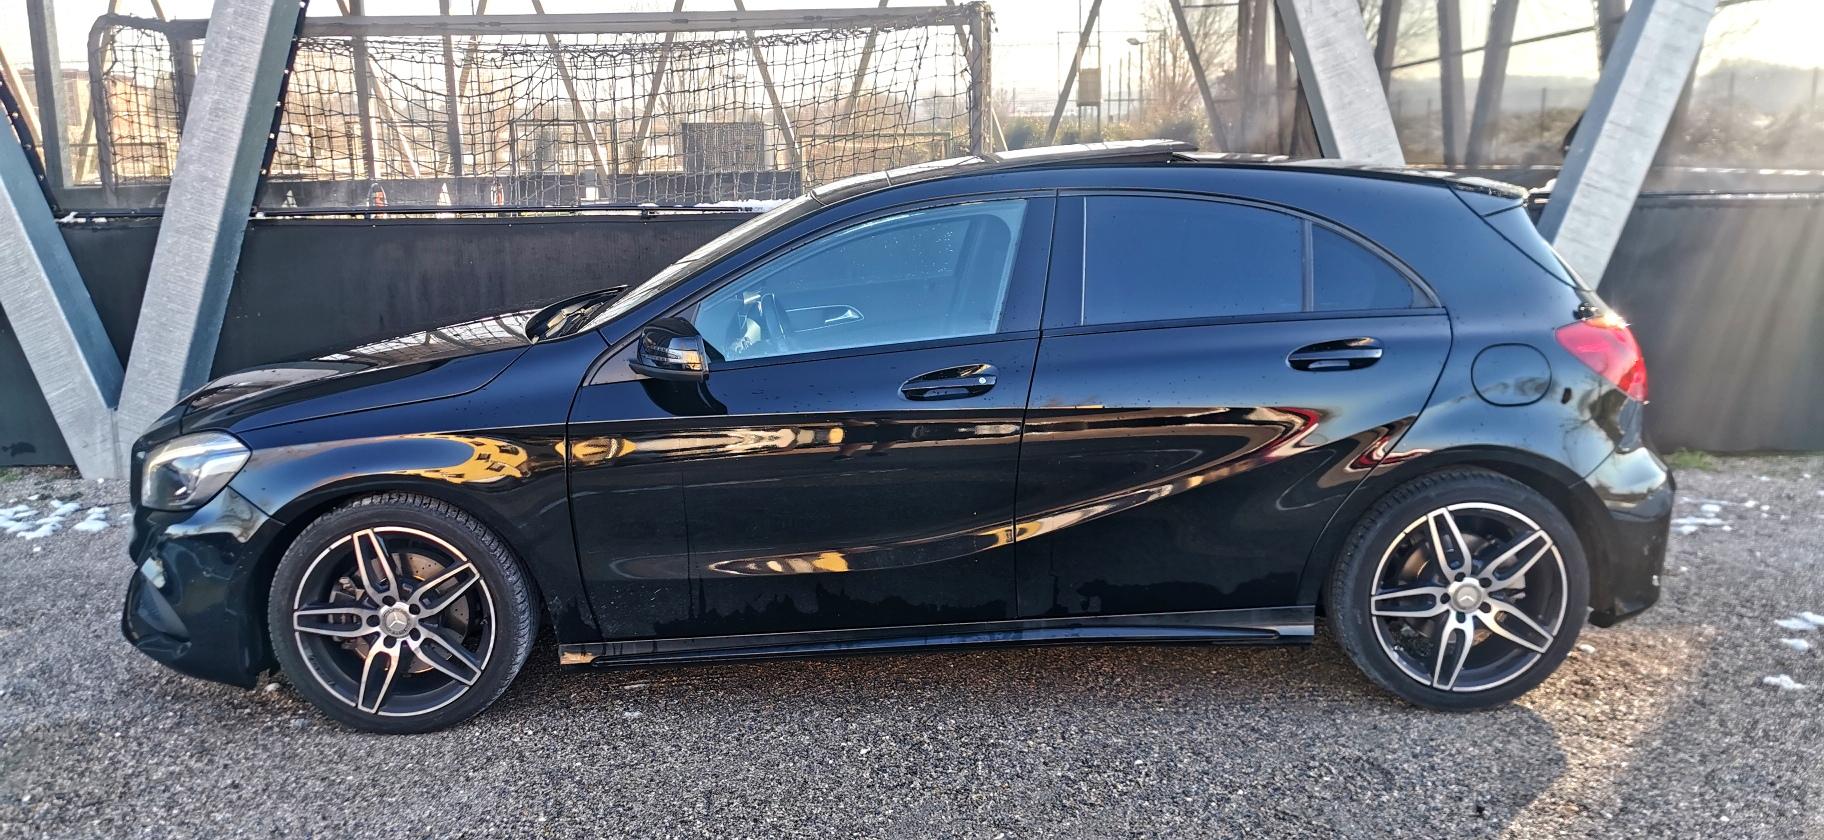 Mercedes Classe A 200d - Ellak Auto Sud